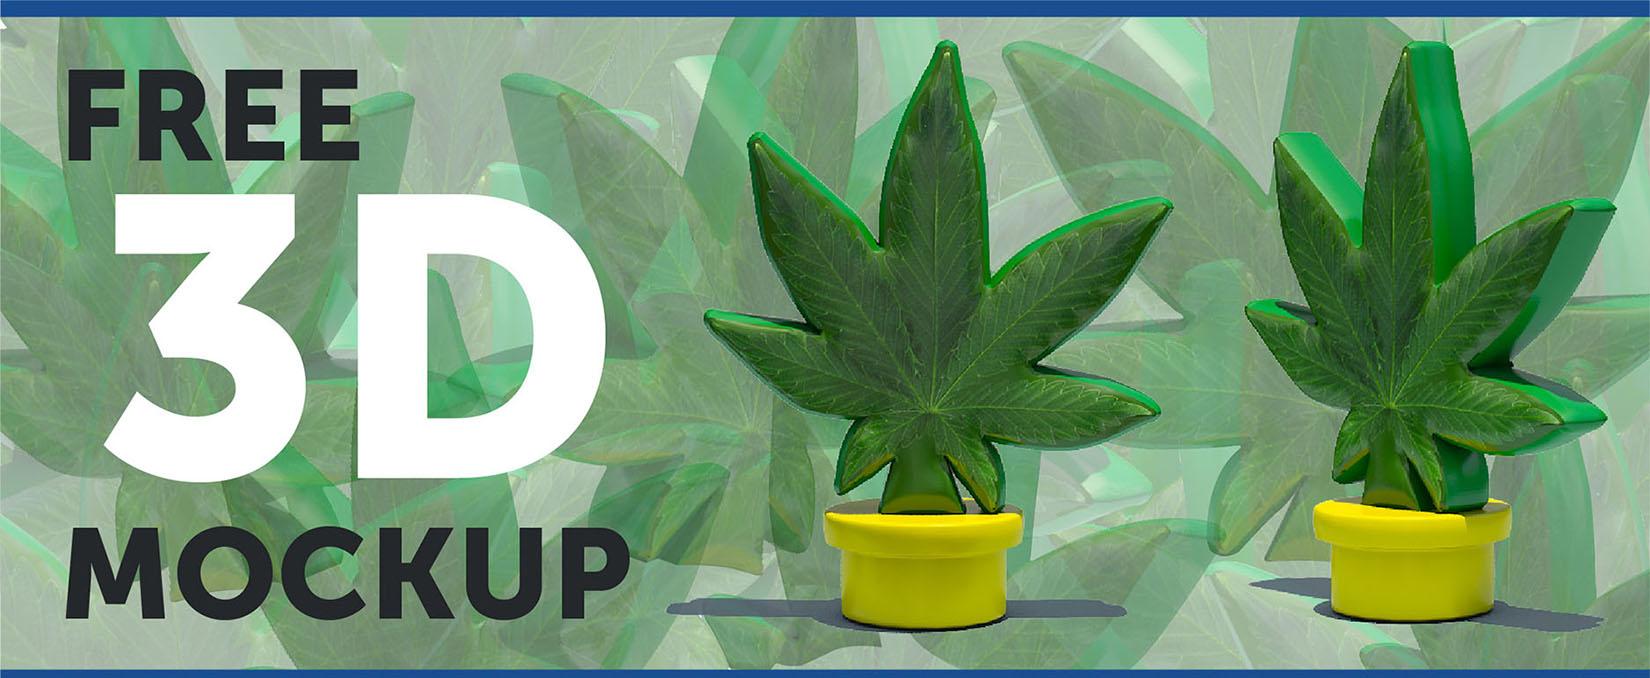 Marijuana-free-3d-rendering